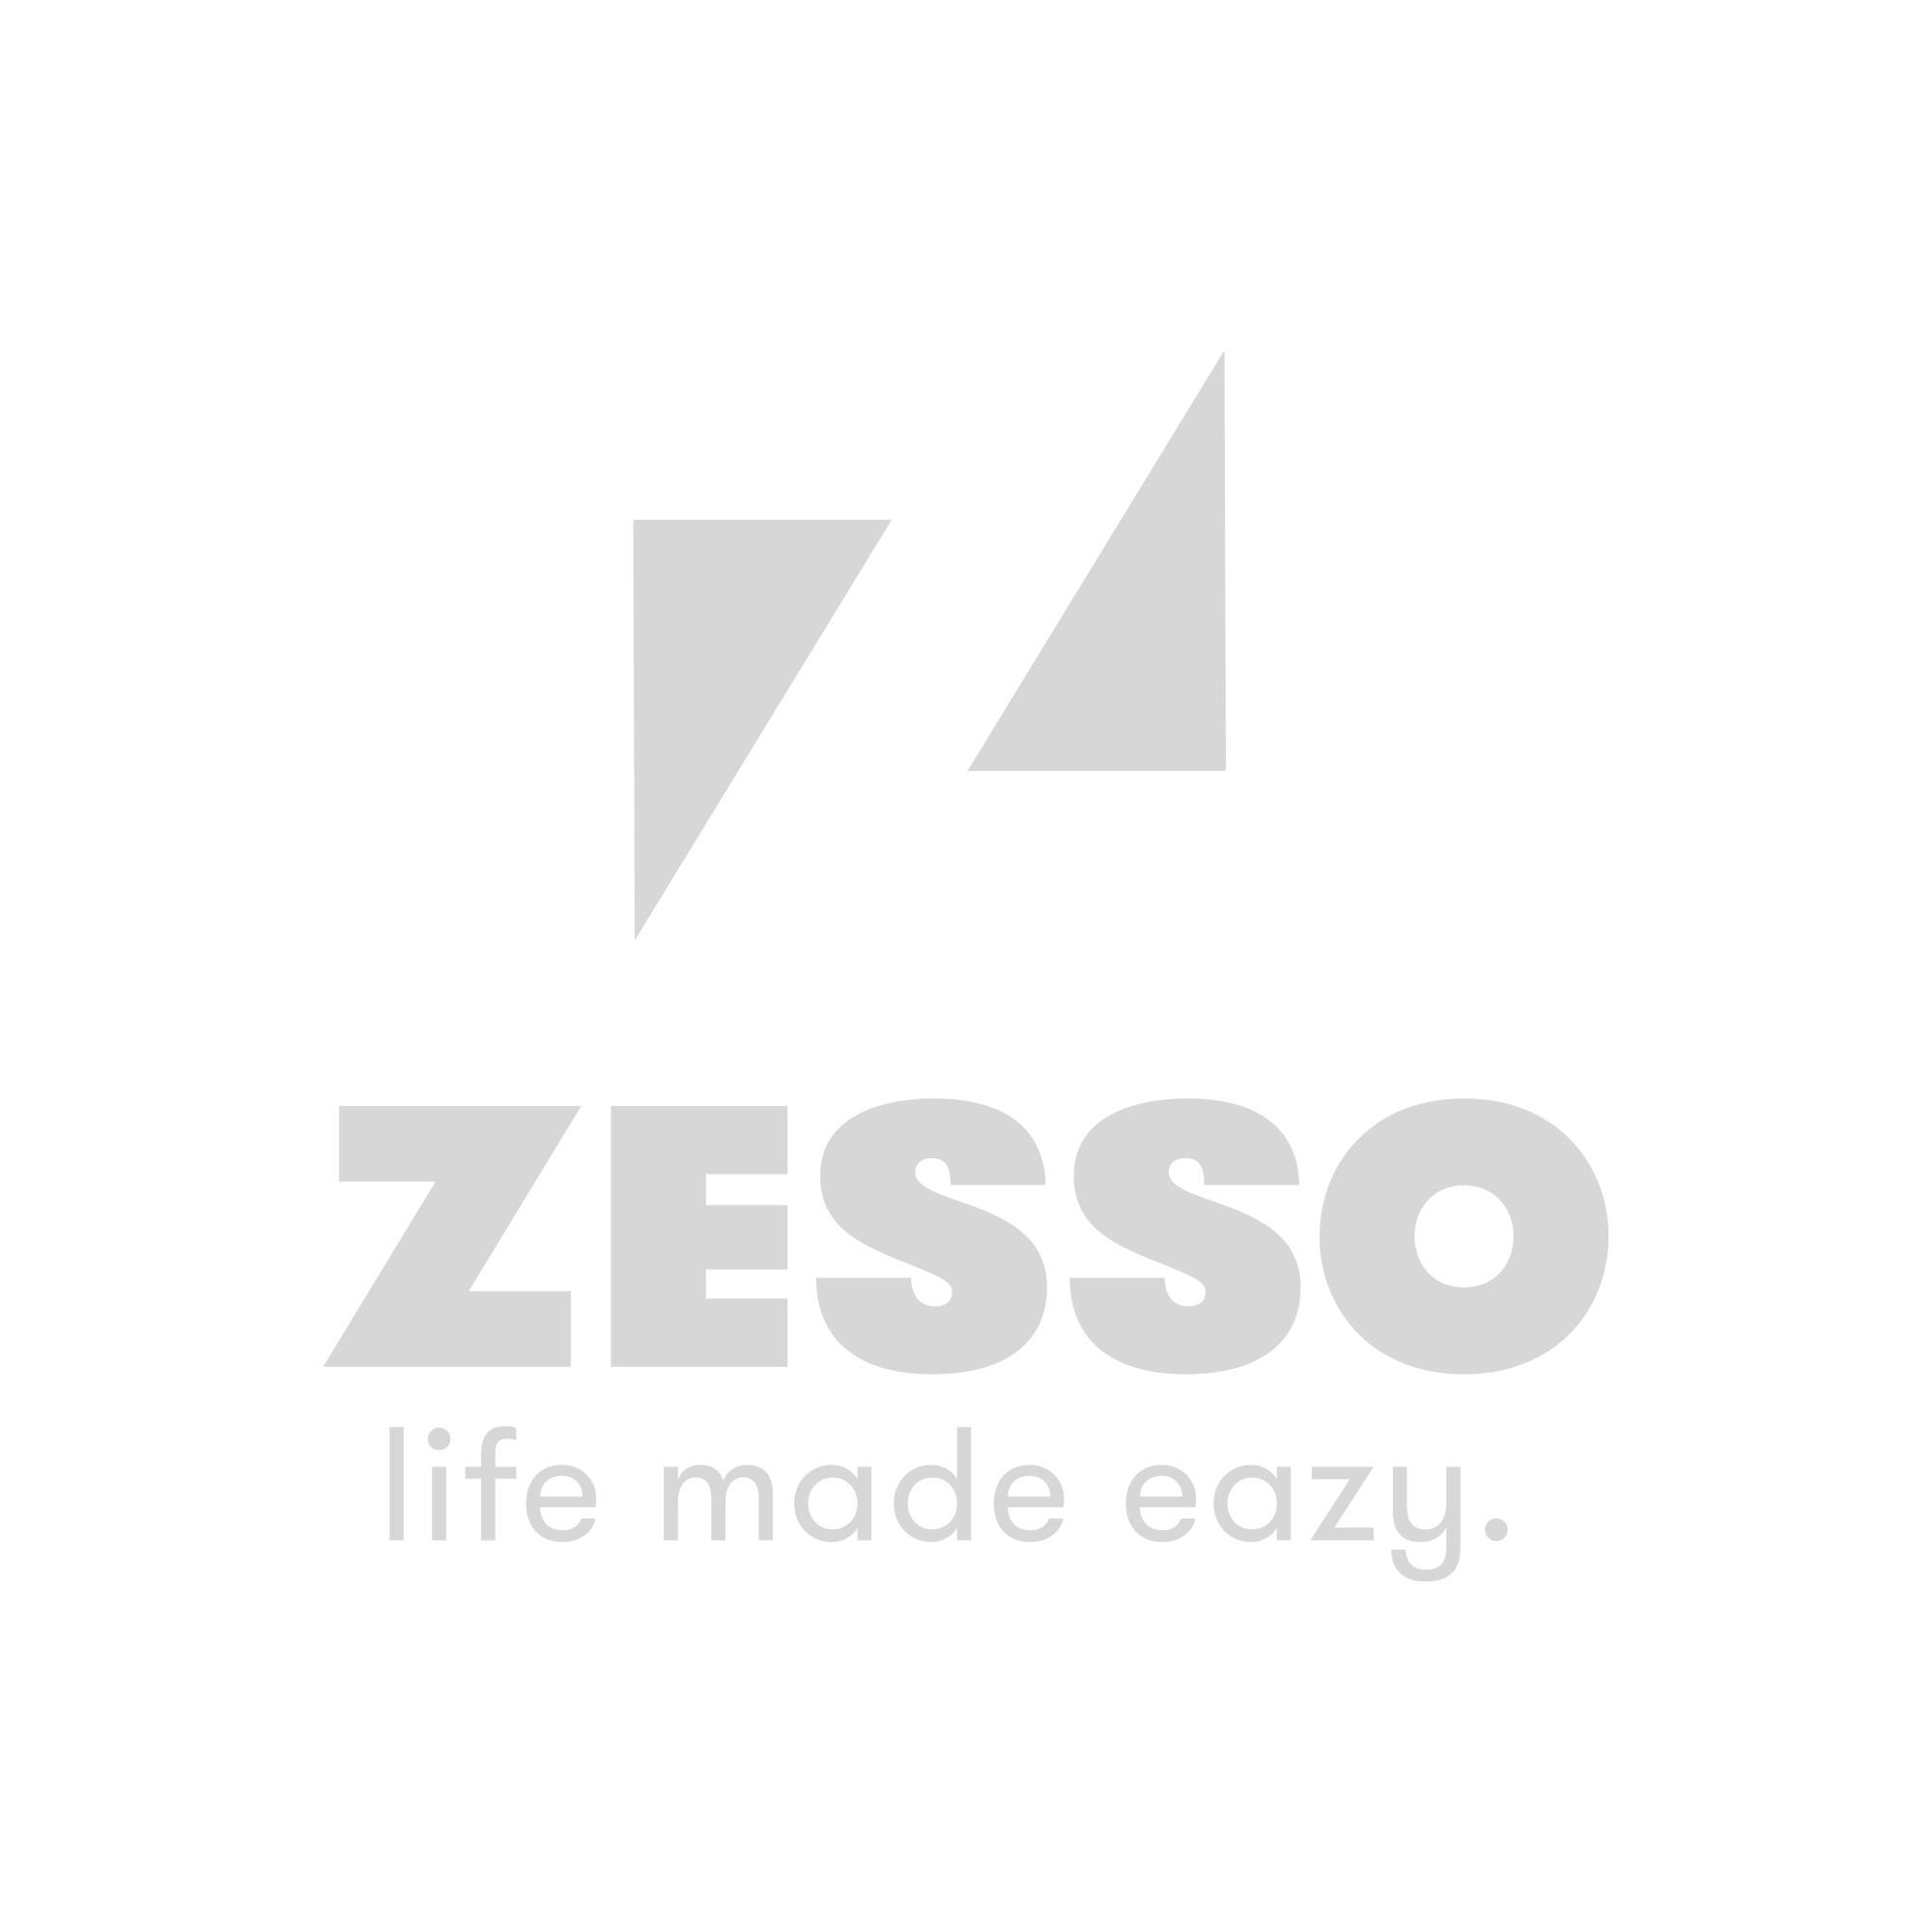 Tweedekans - Baninni Loopfiets 2 - 3 Jaar Wheely Roze